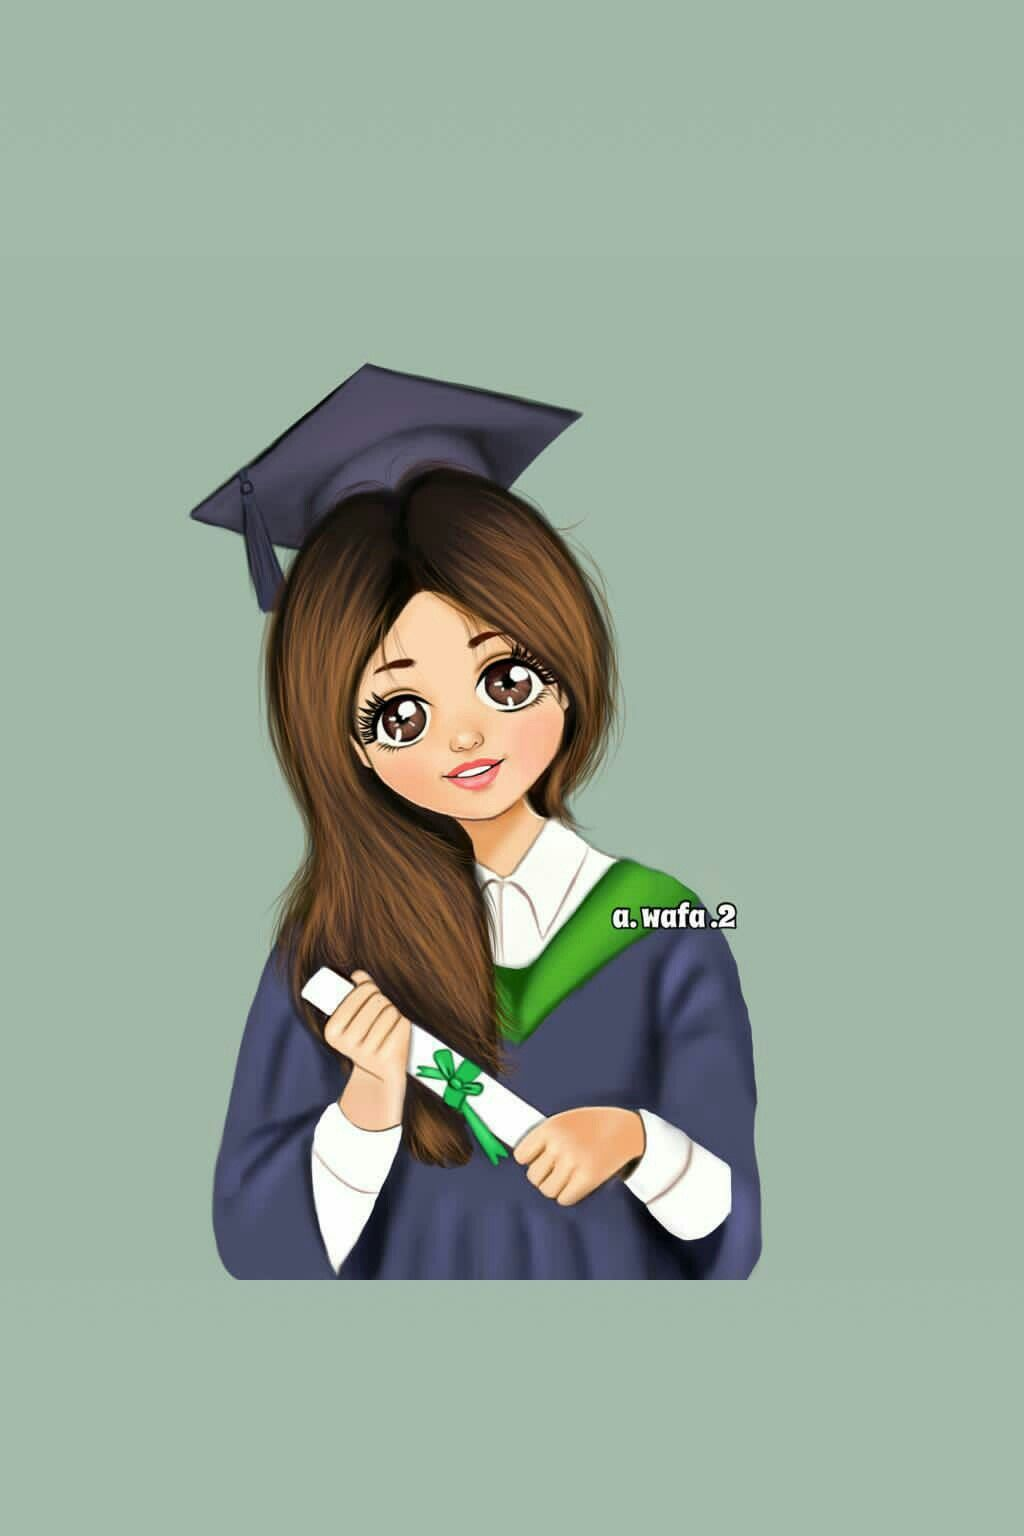 Pin By Princess Samah On A Wafa 2 Graduation Girl Graduation Art Graduation Drawing